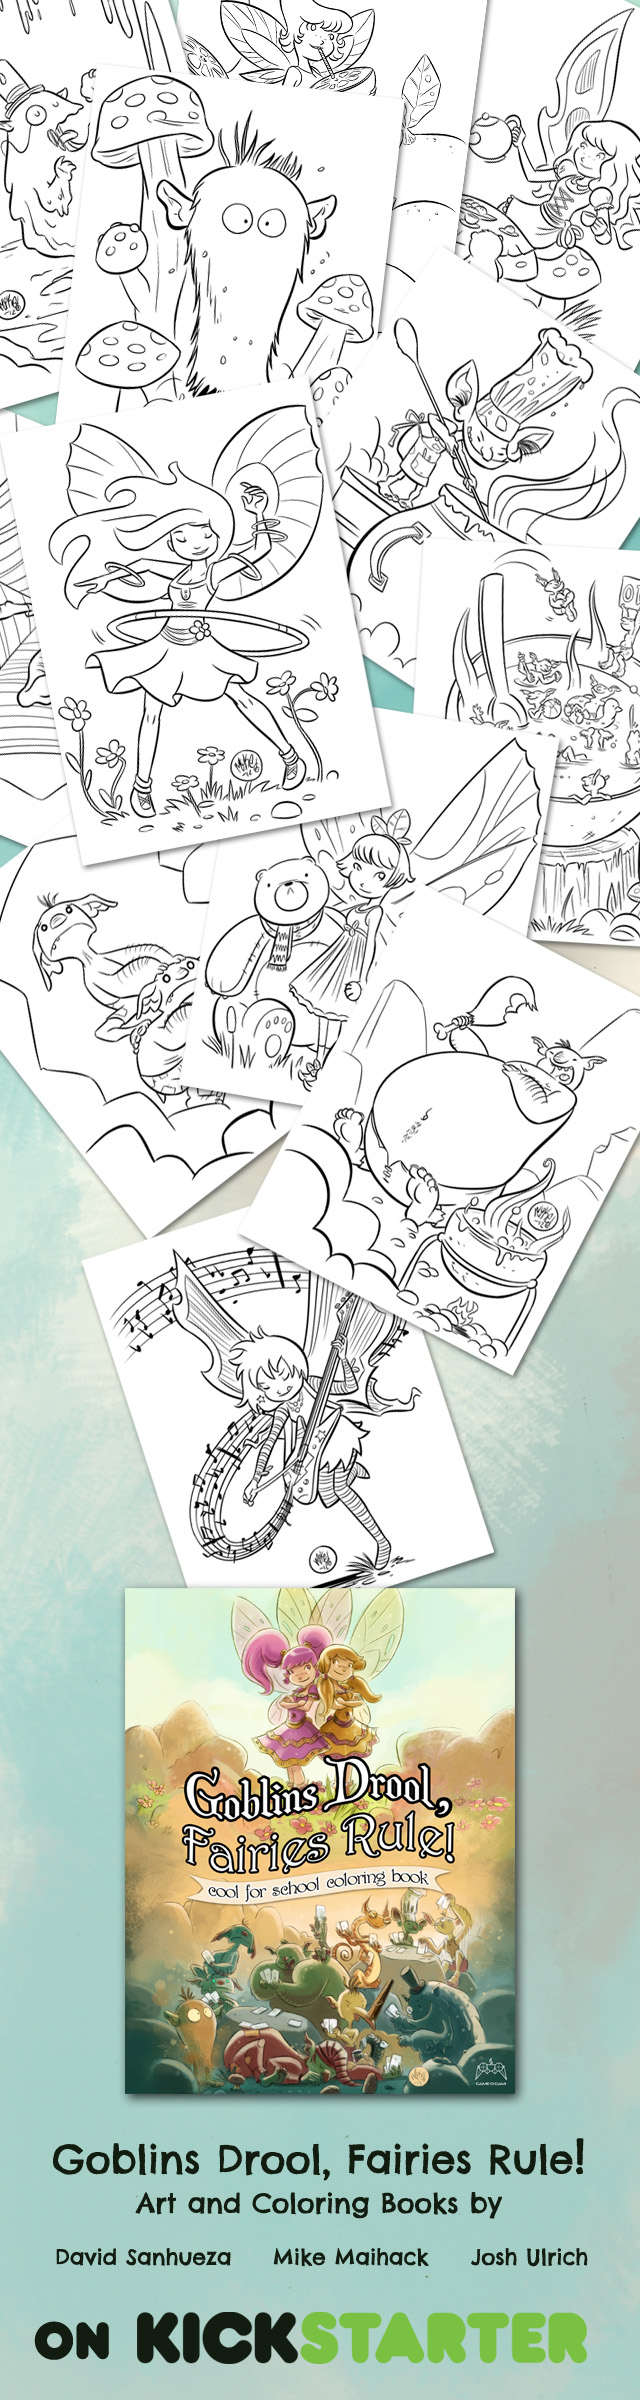 Goblins Drool Fairies Rule coloring book Kickstarter